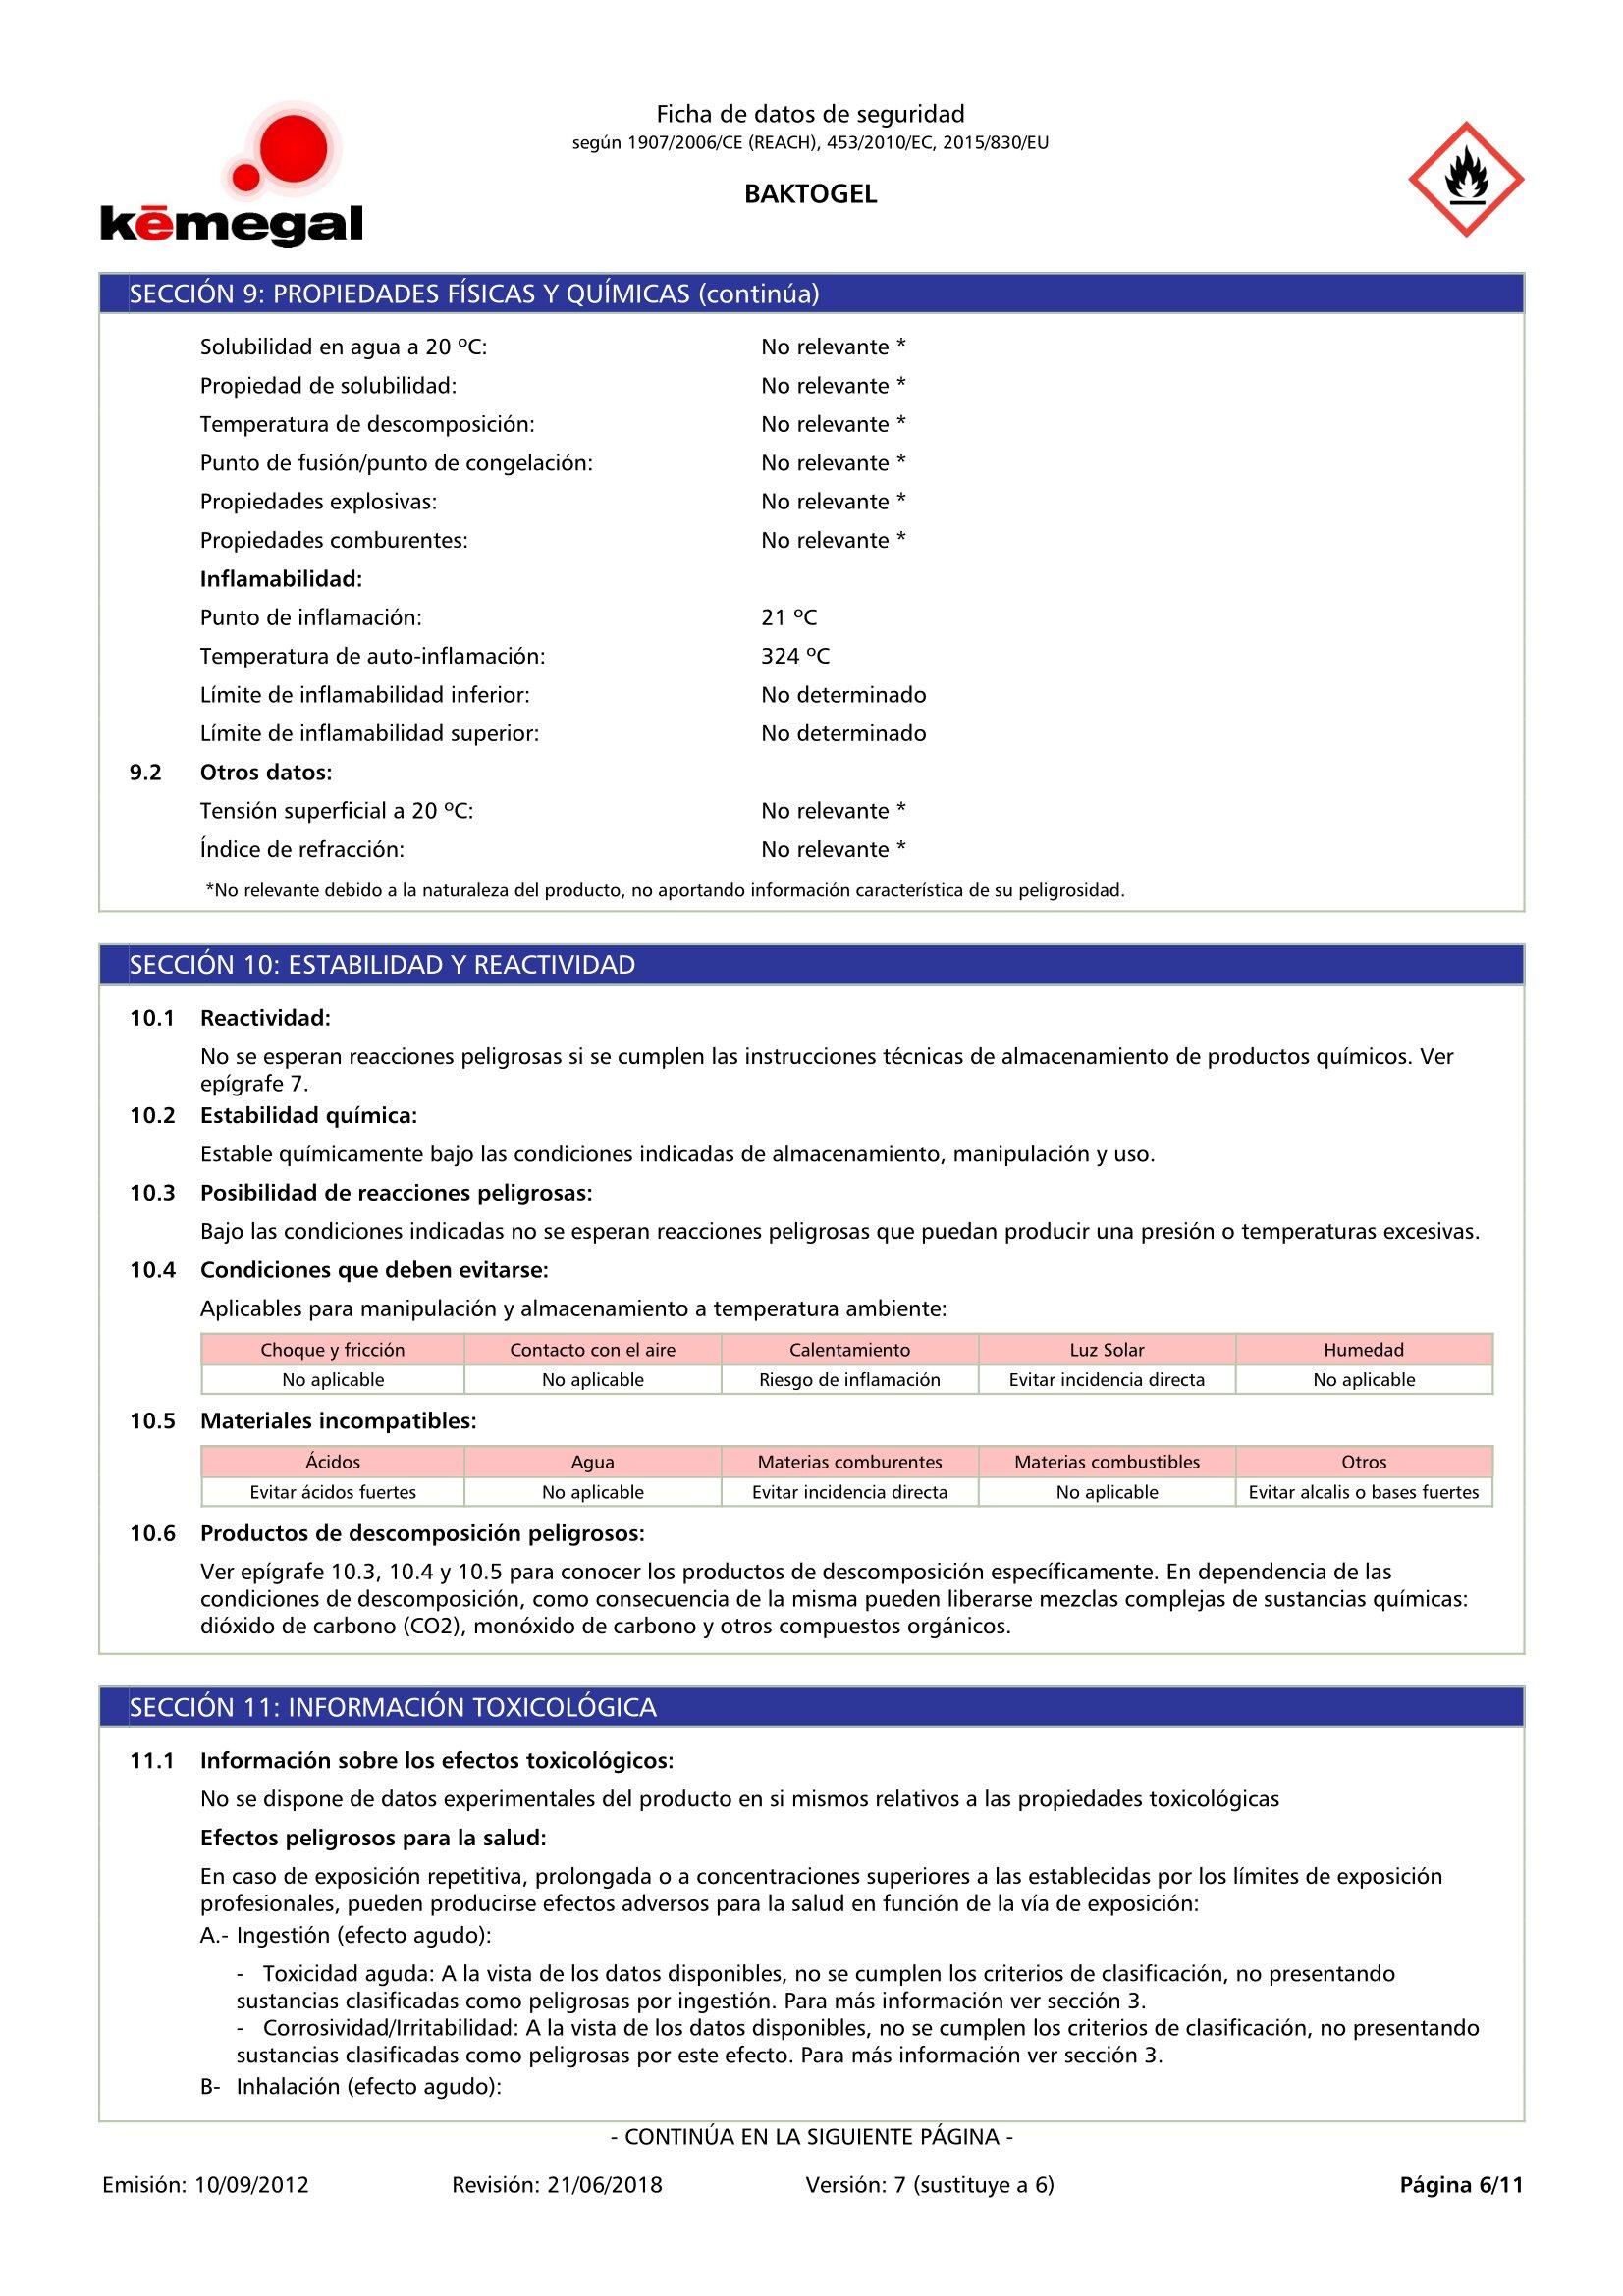 SAFIR FISIOTERAPIA CORUA BAKTOGEL_0006jpg